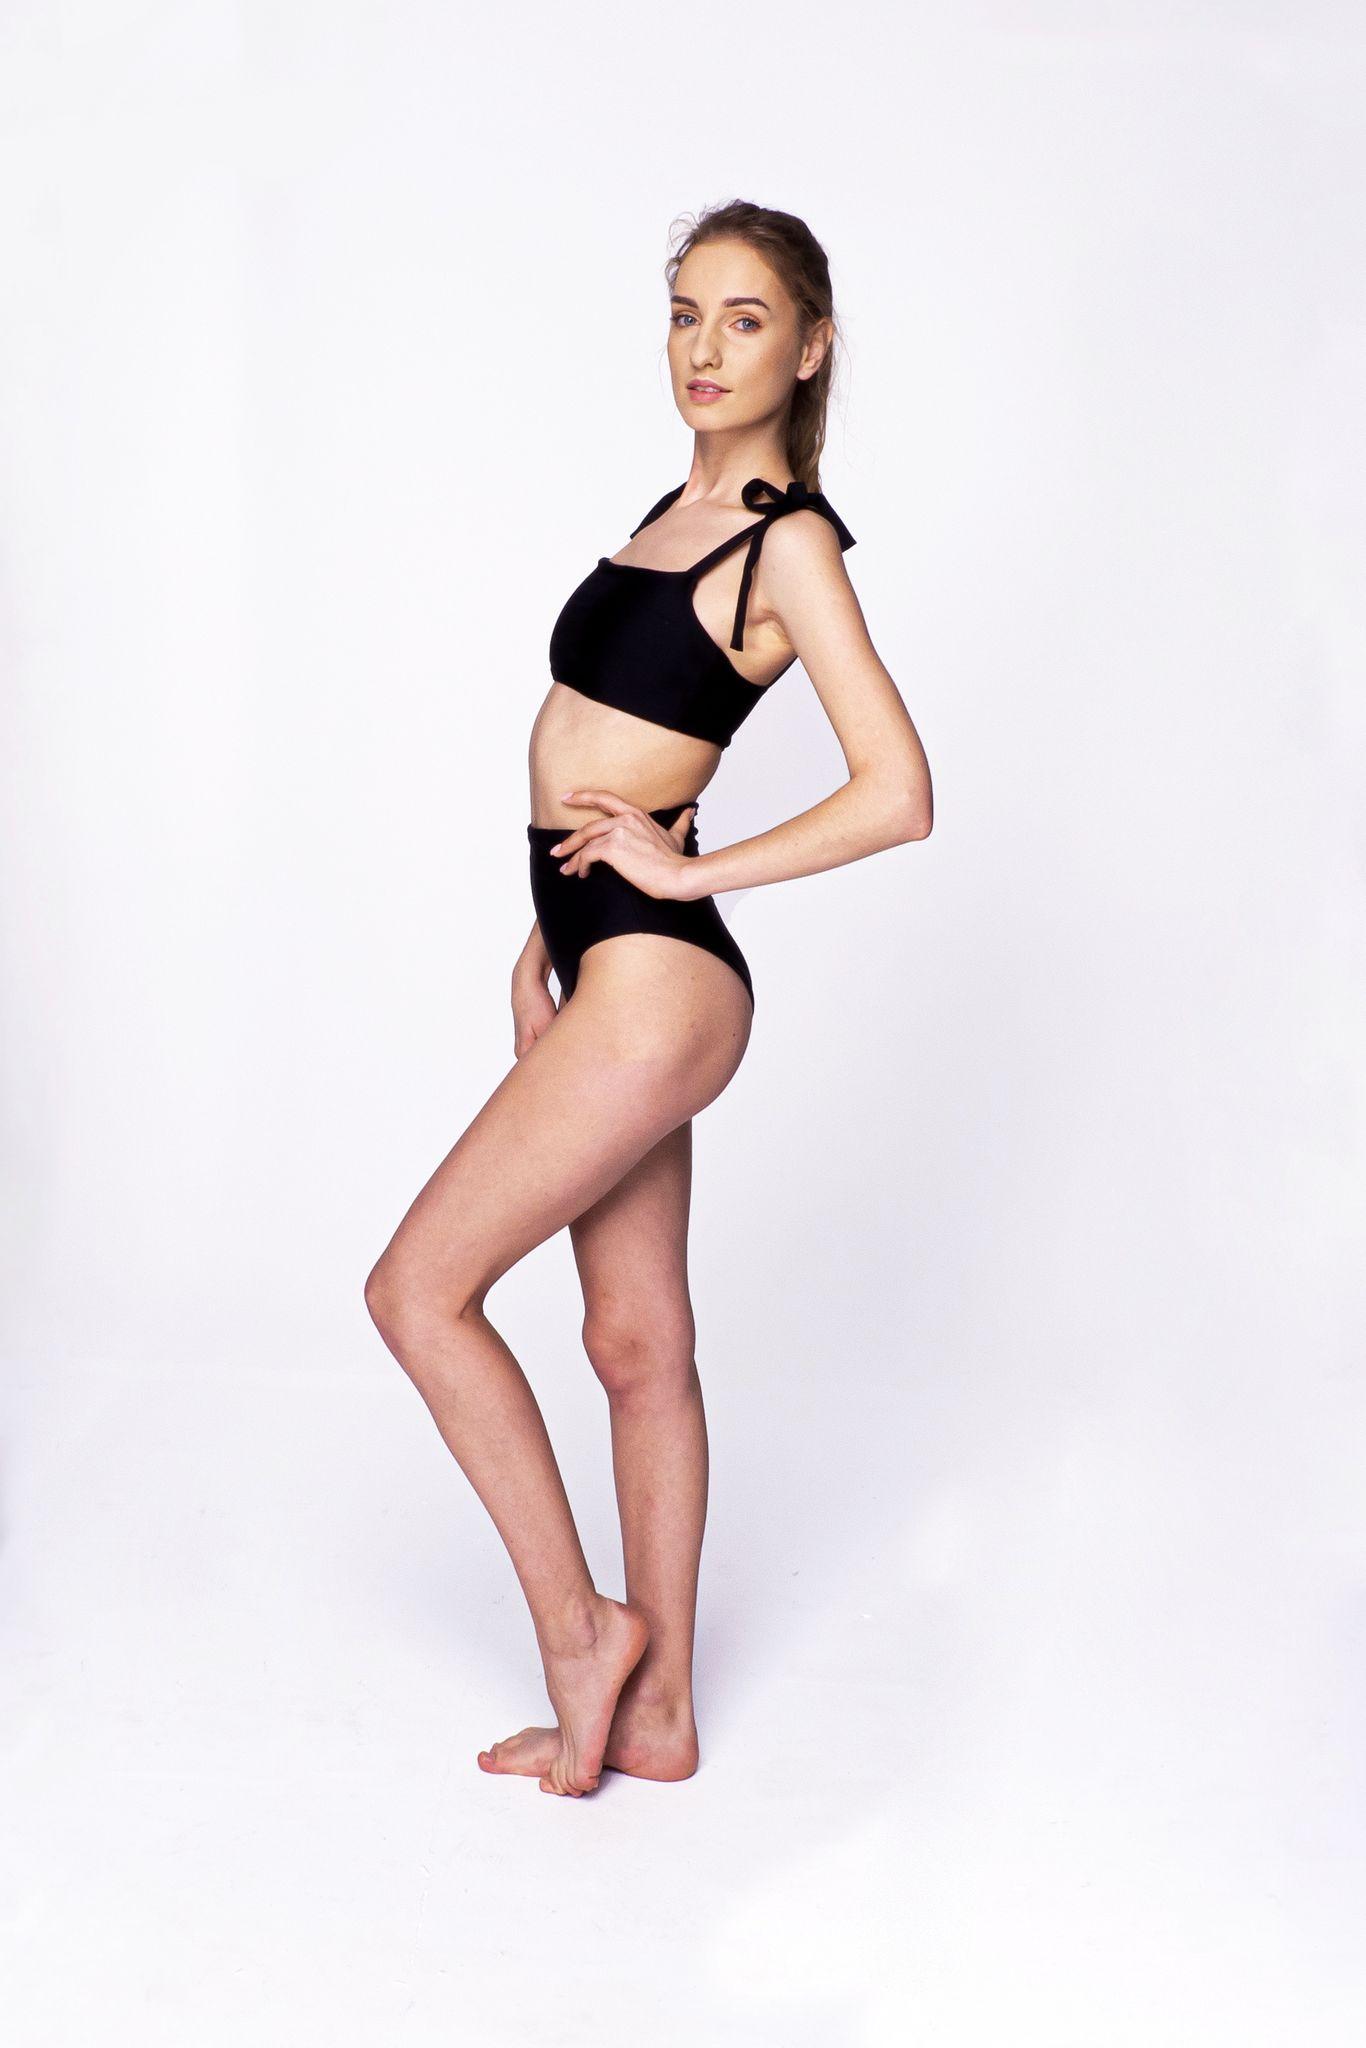 Figi Keep it simple Black - LILY ZEAL | JestemSlow.pl